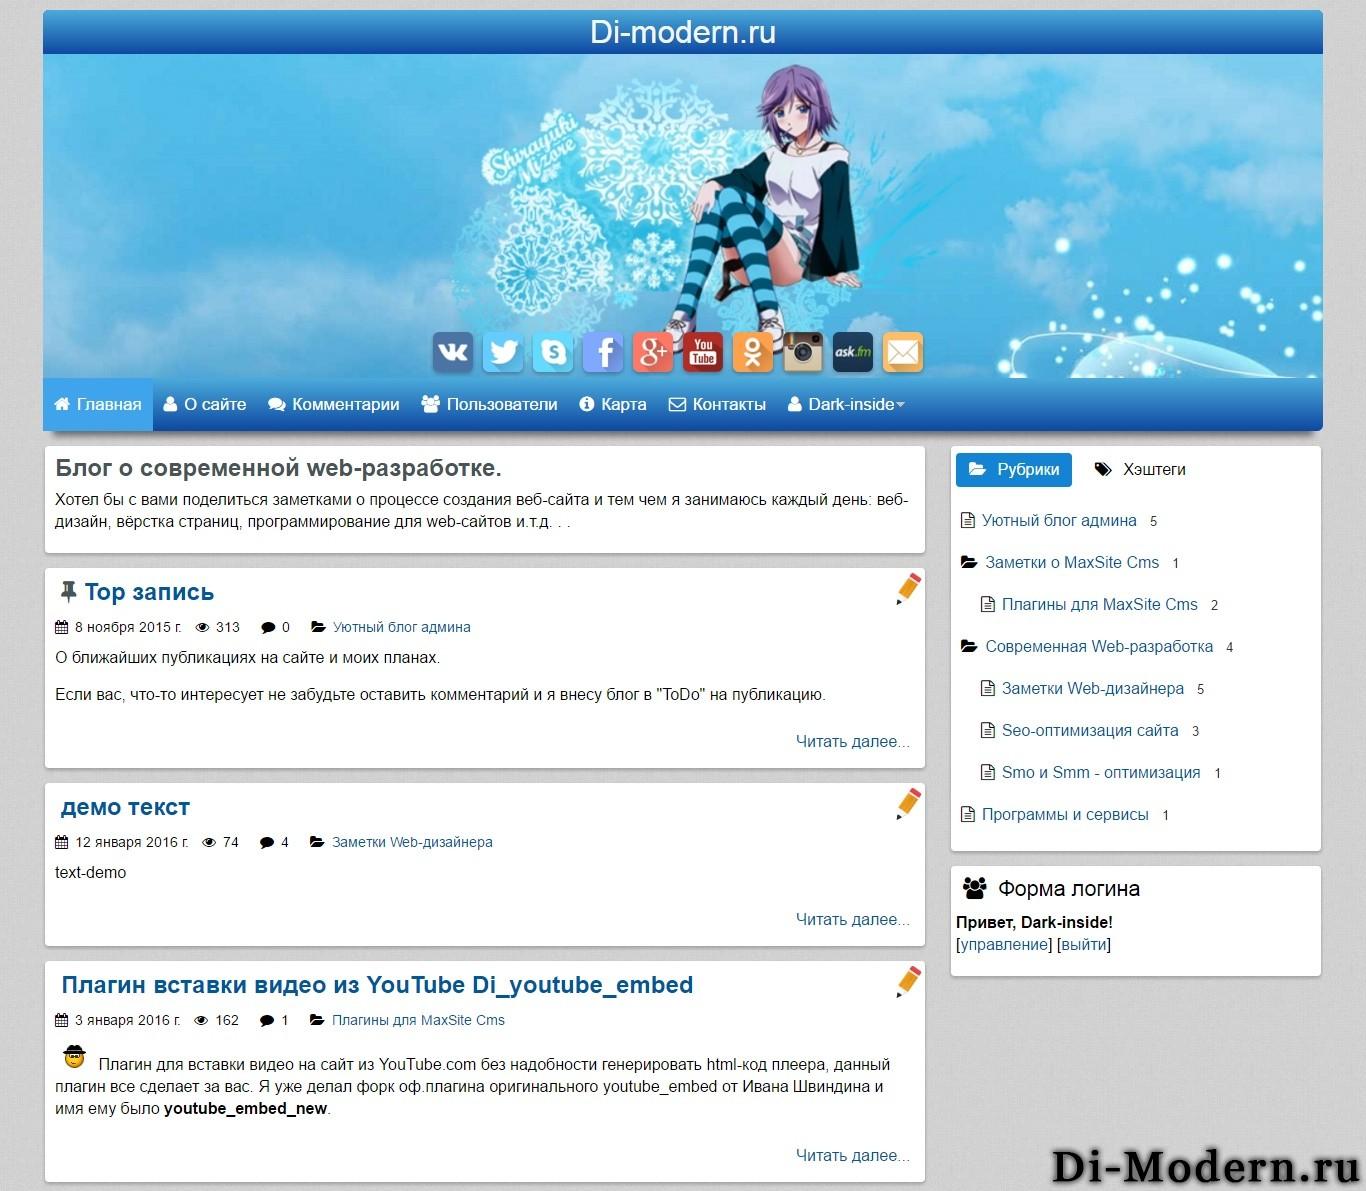 MaxHub - Сообщество MaxSite CMS: плагины, шаблоны, новости